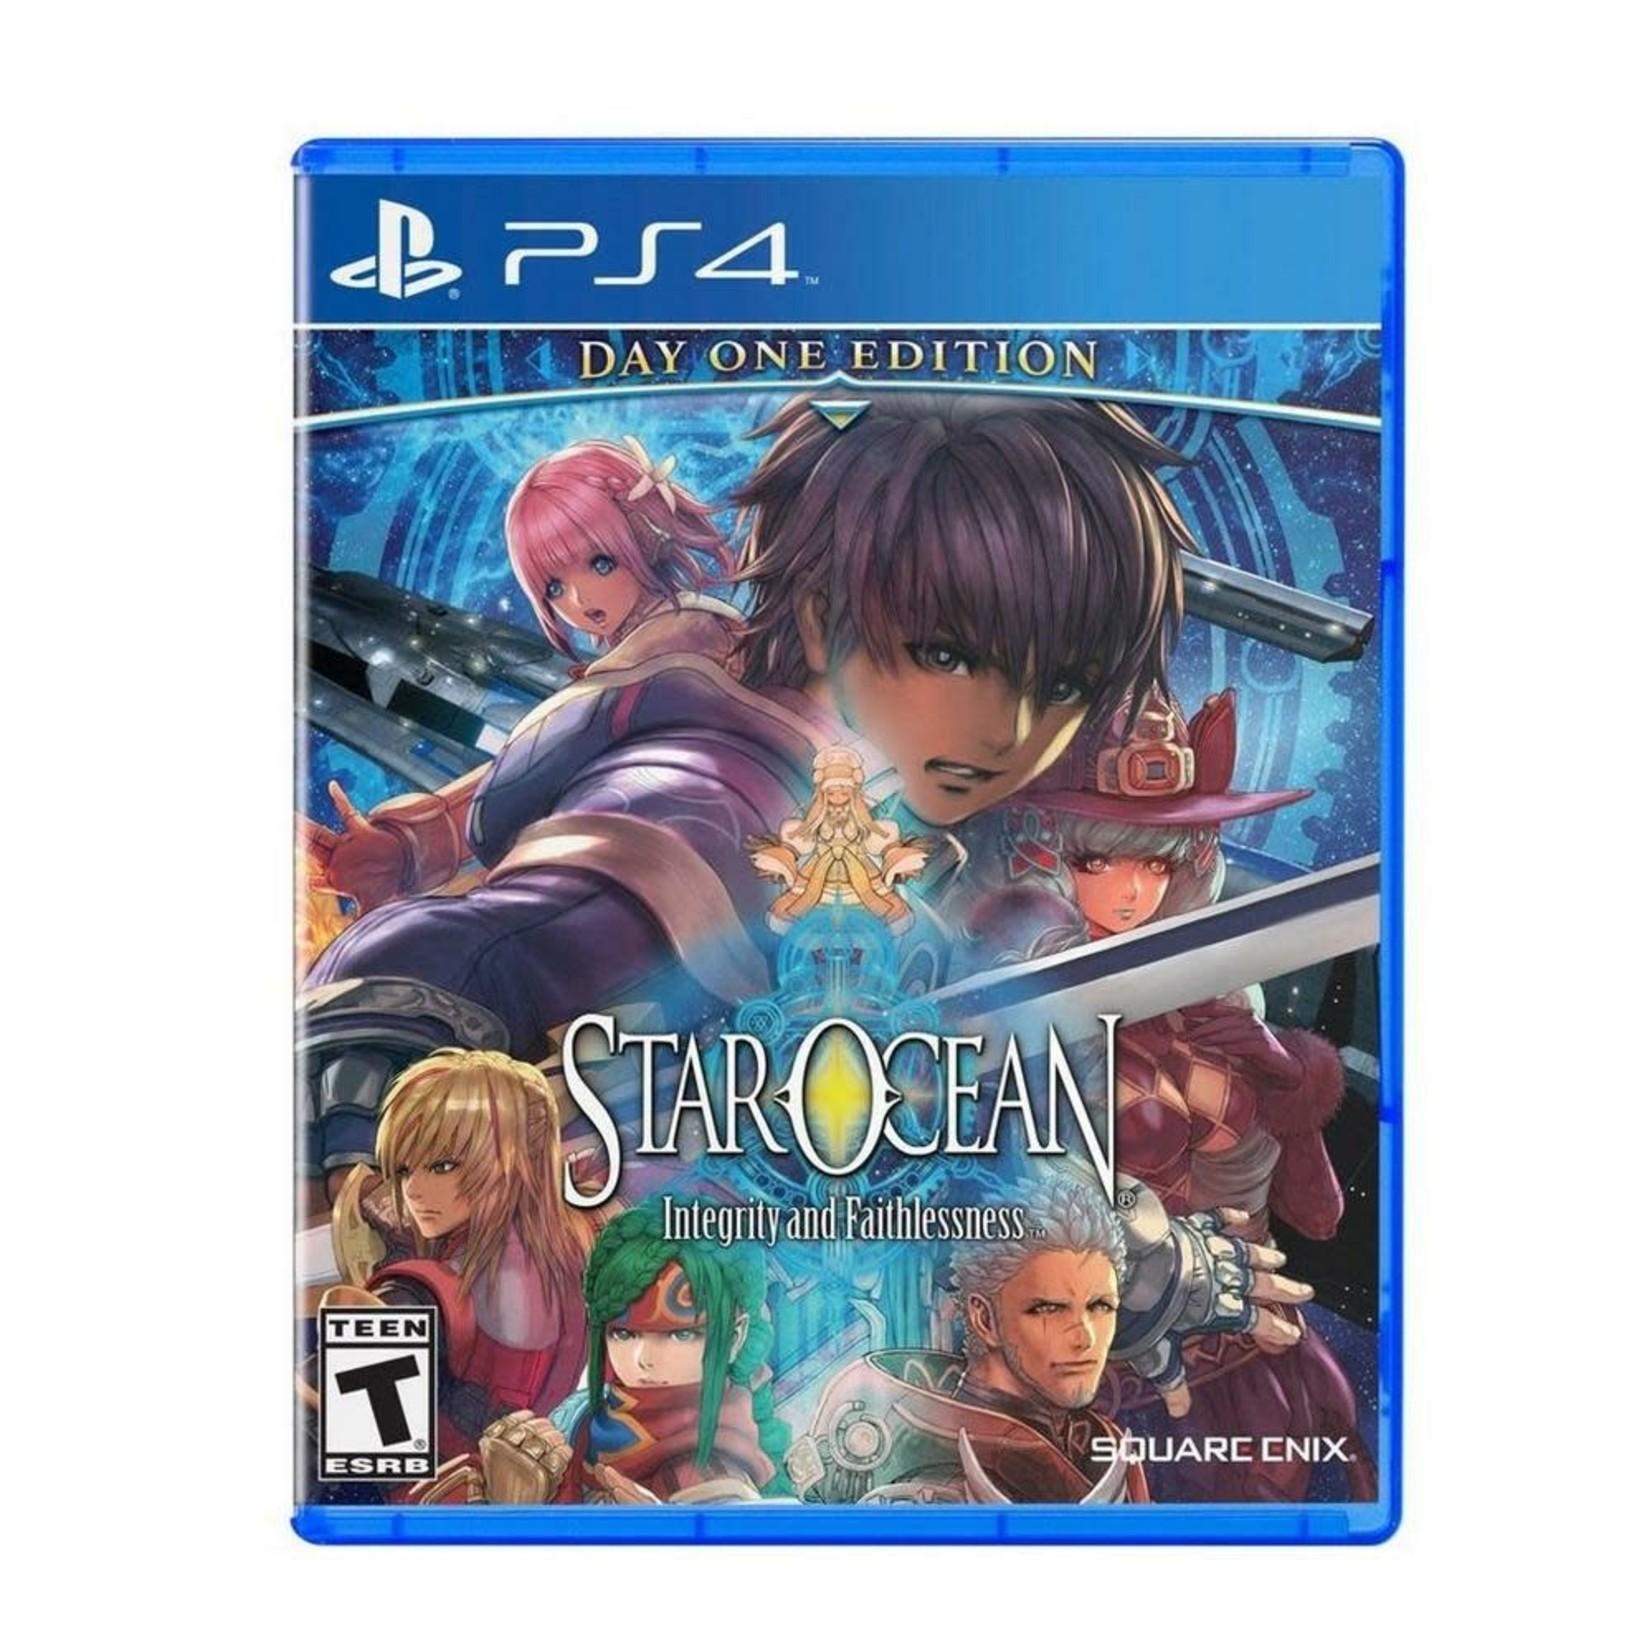 PS4U-Star Ocean: Integrity and Faithlessness